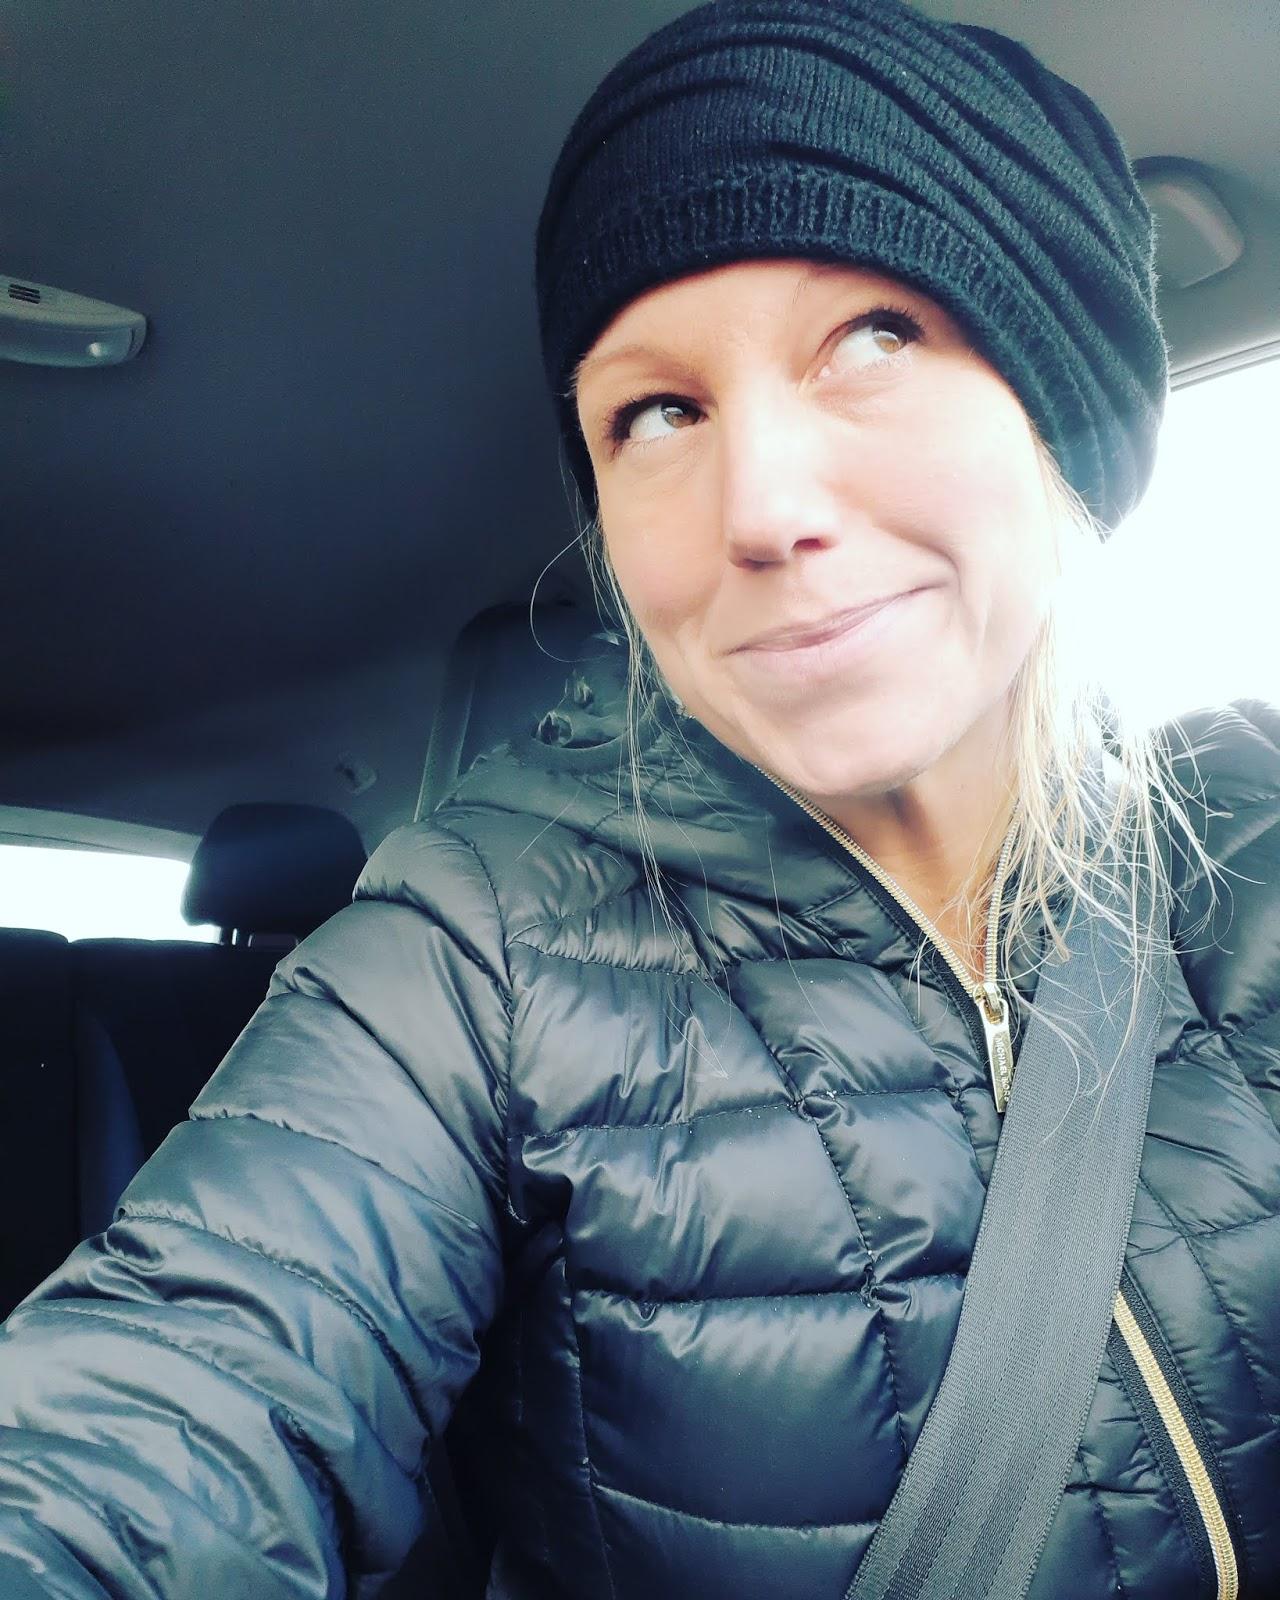 Charlotte McKinney dating historia